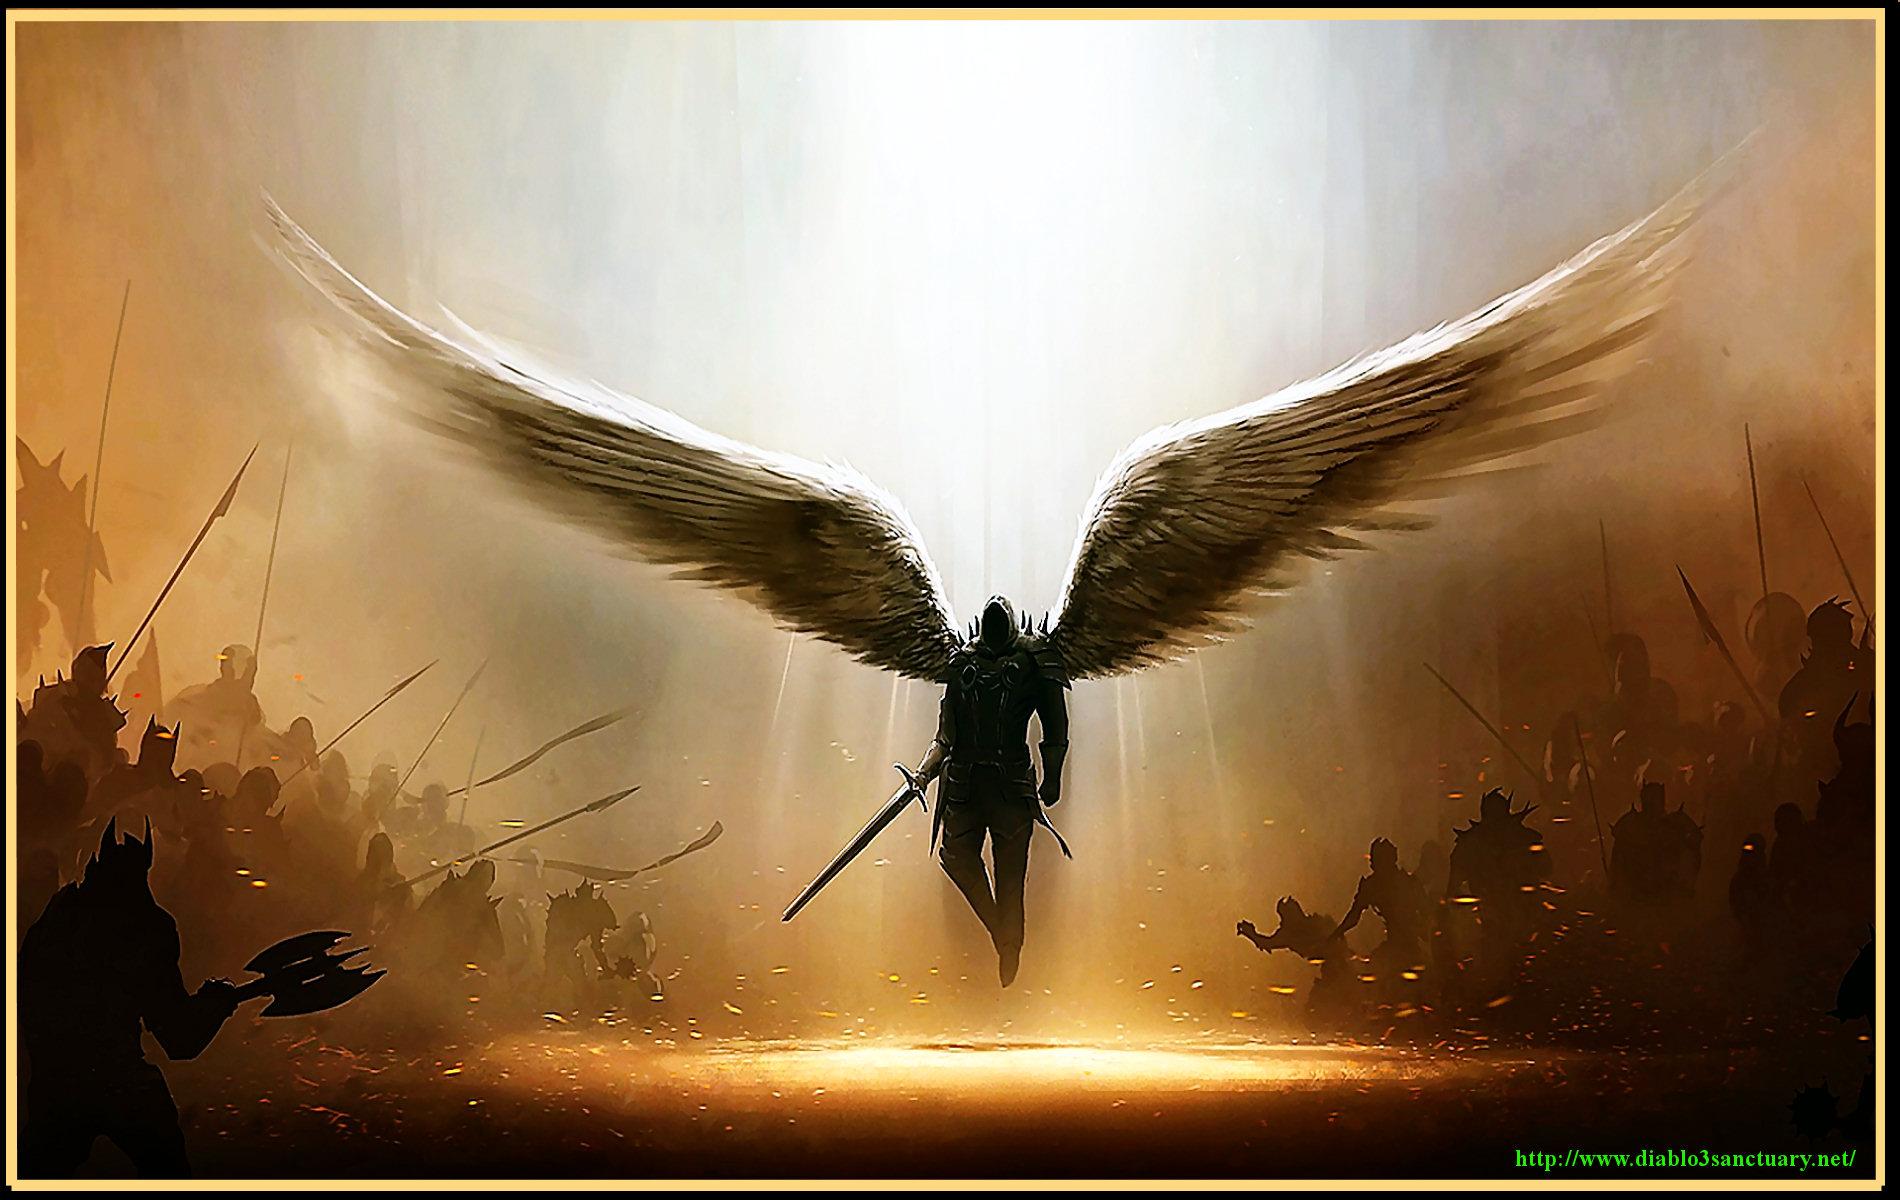 Diablo 3 Archangel Hd Wallpaper Hohomiche